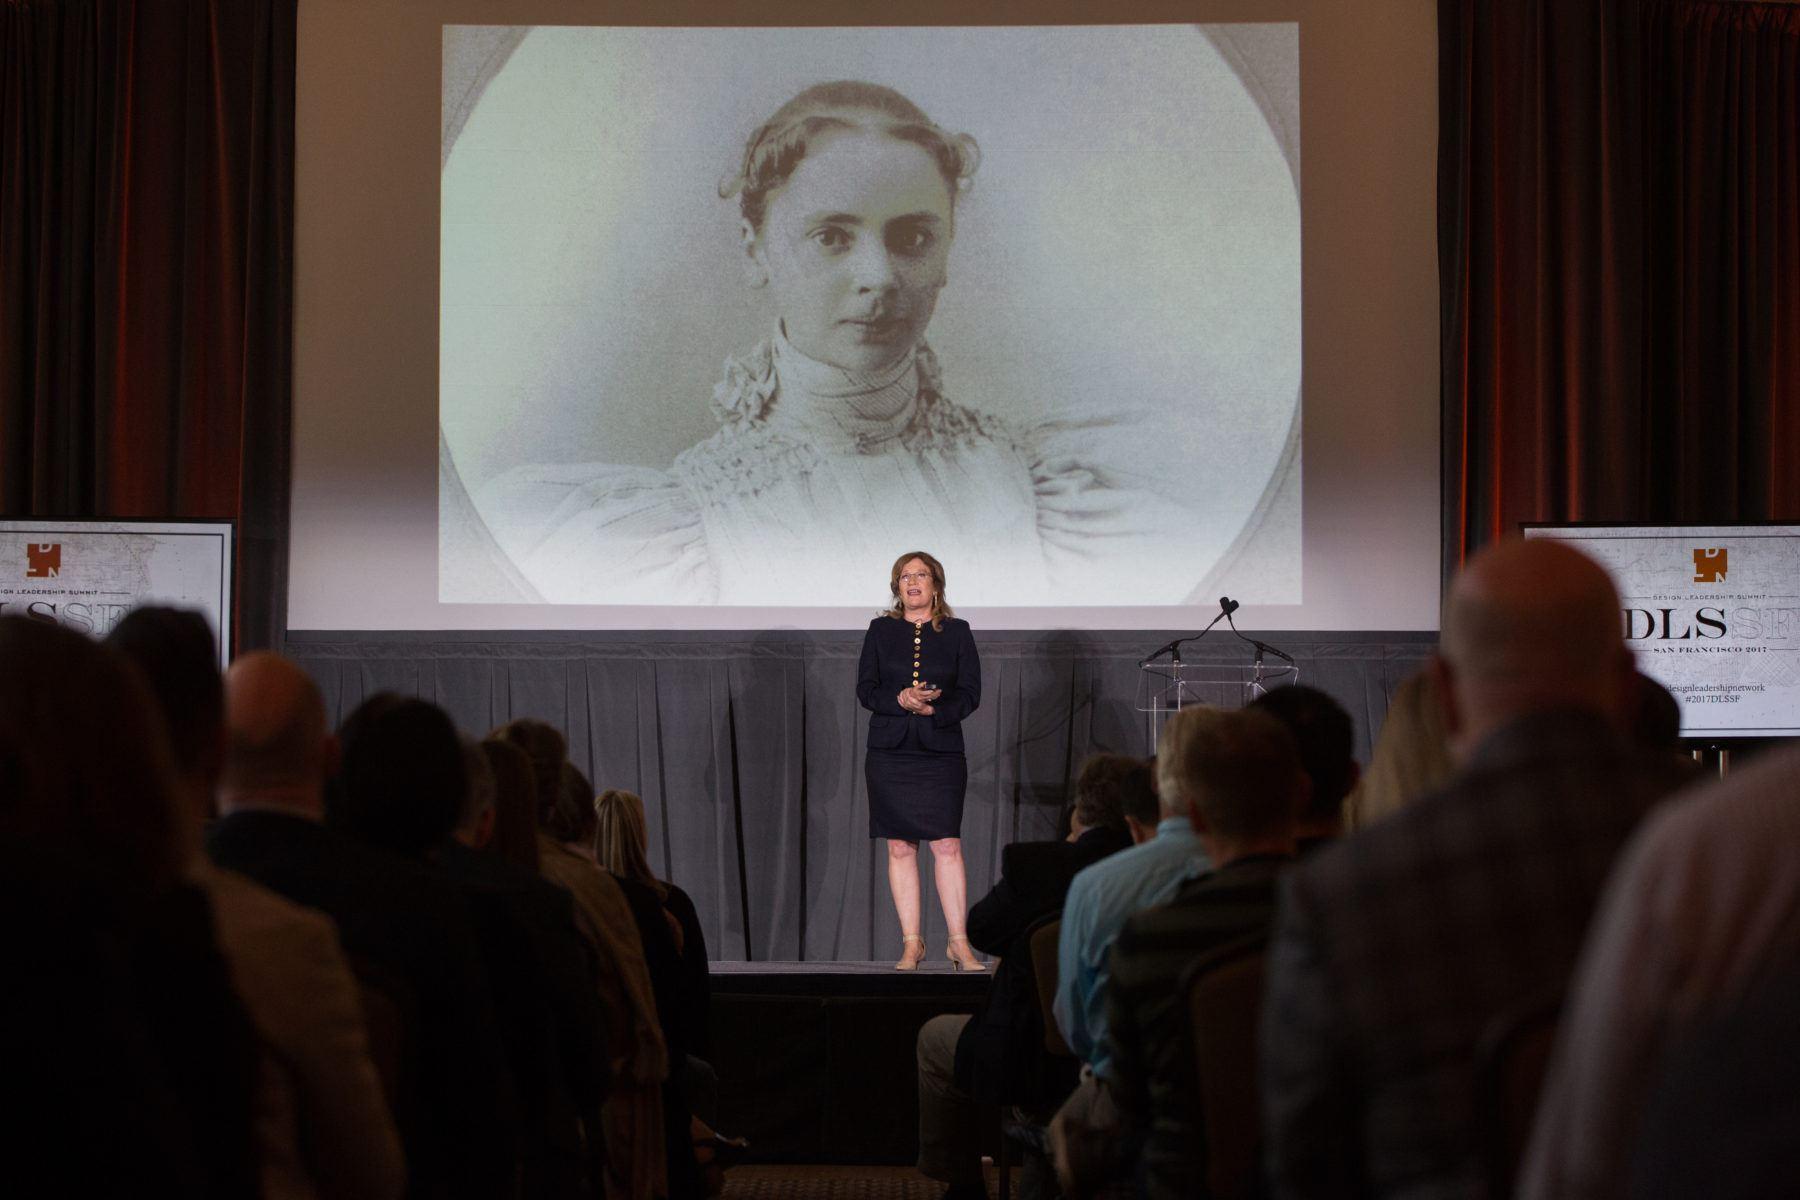 2017 DLS, Victoria Kastner – Julia Morgan: San Francisco's Trailblazing Architect